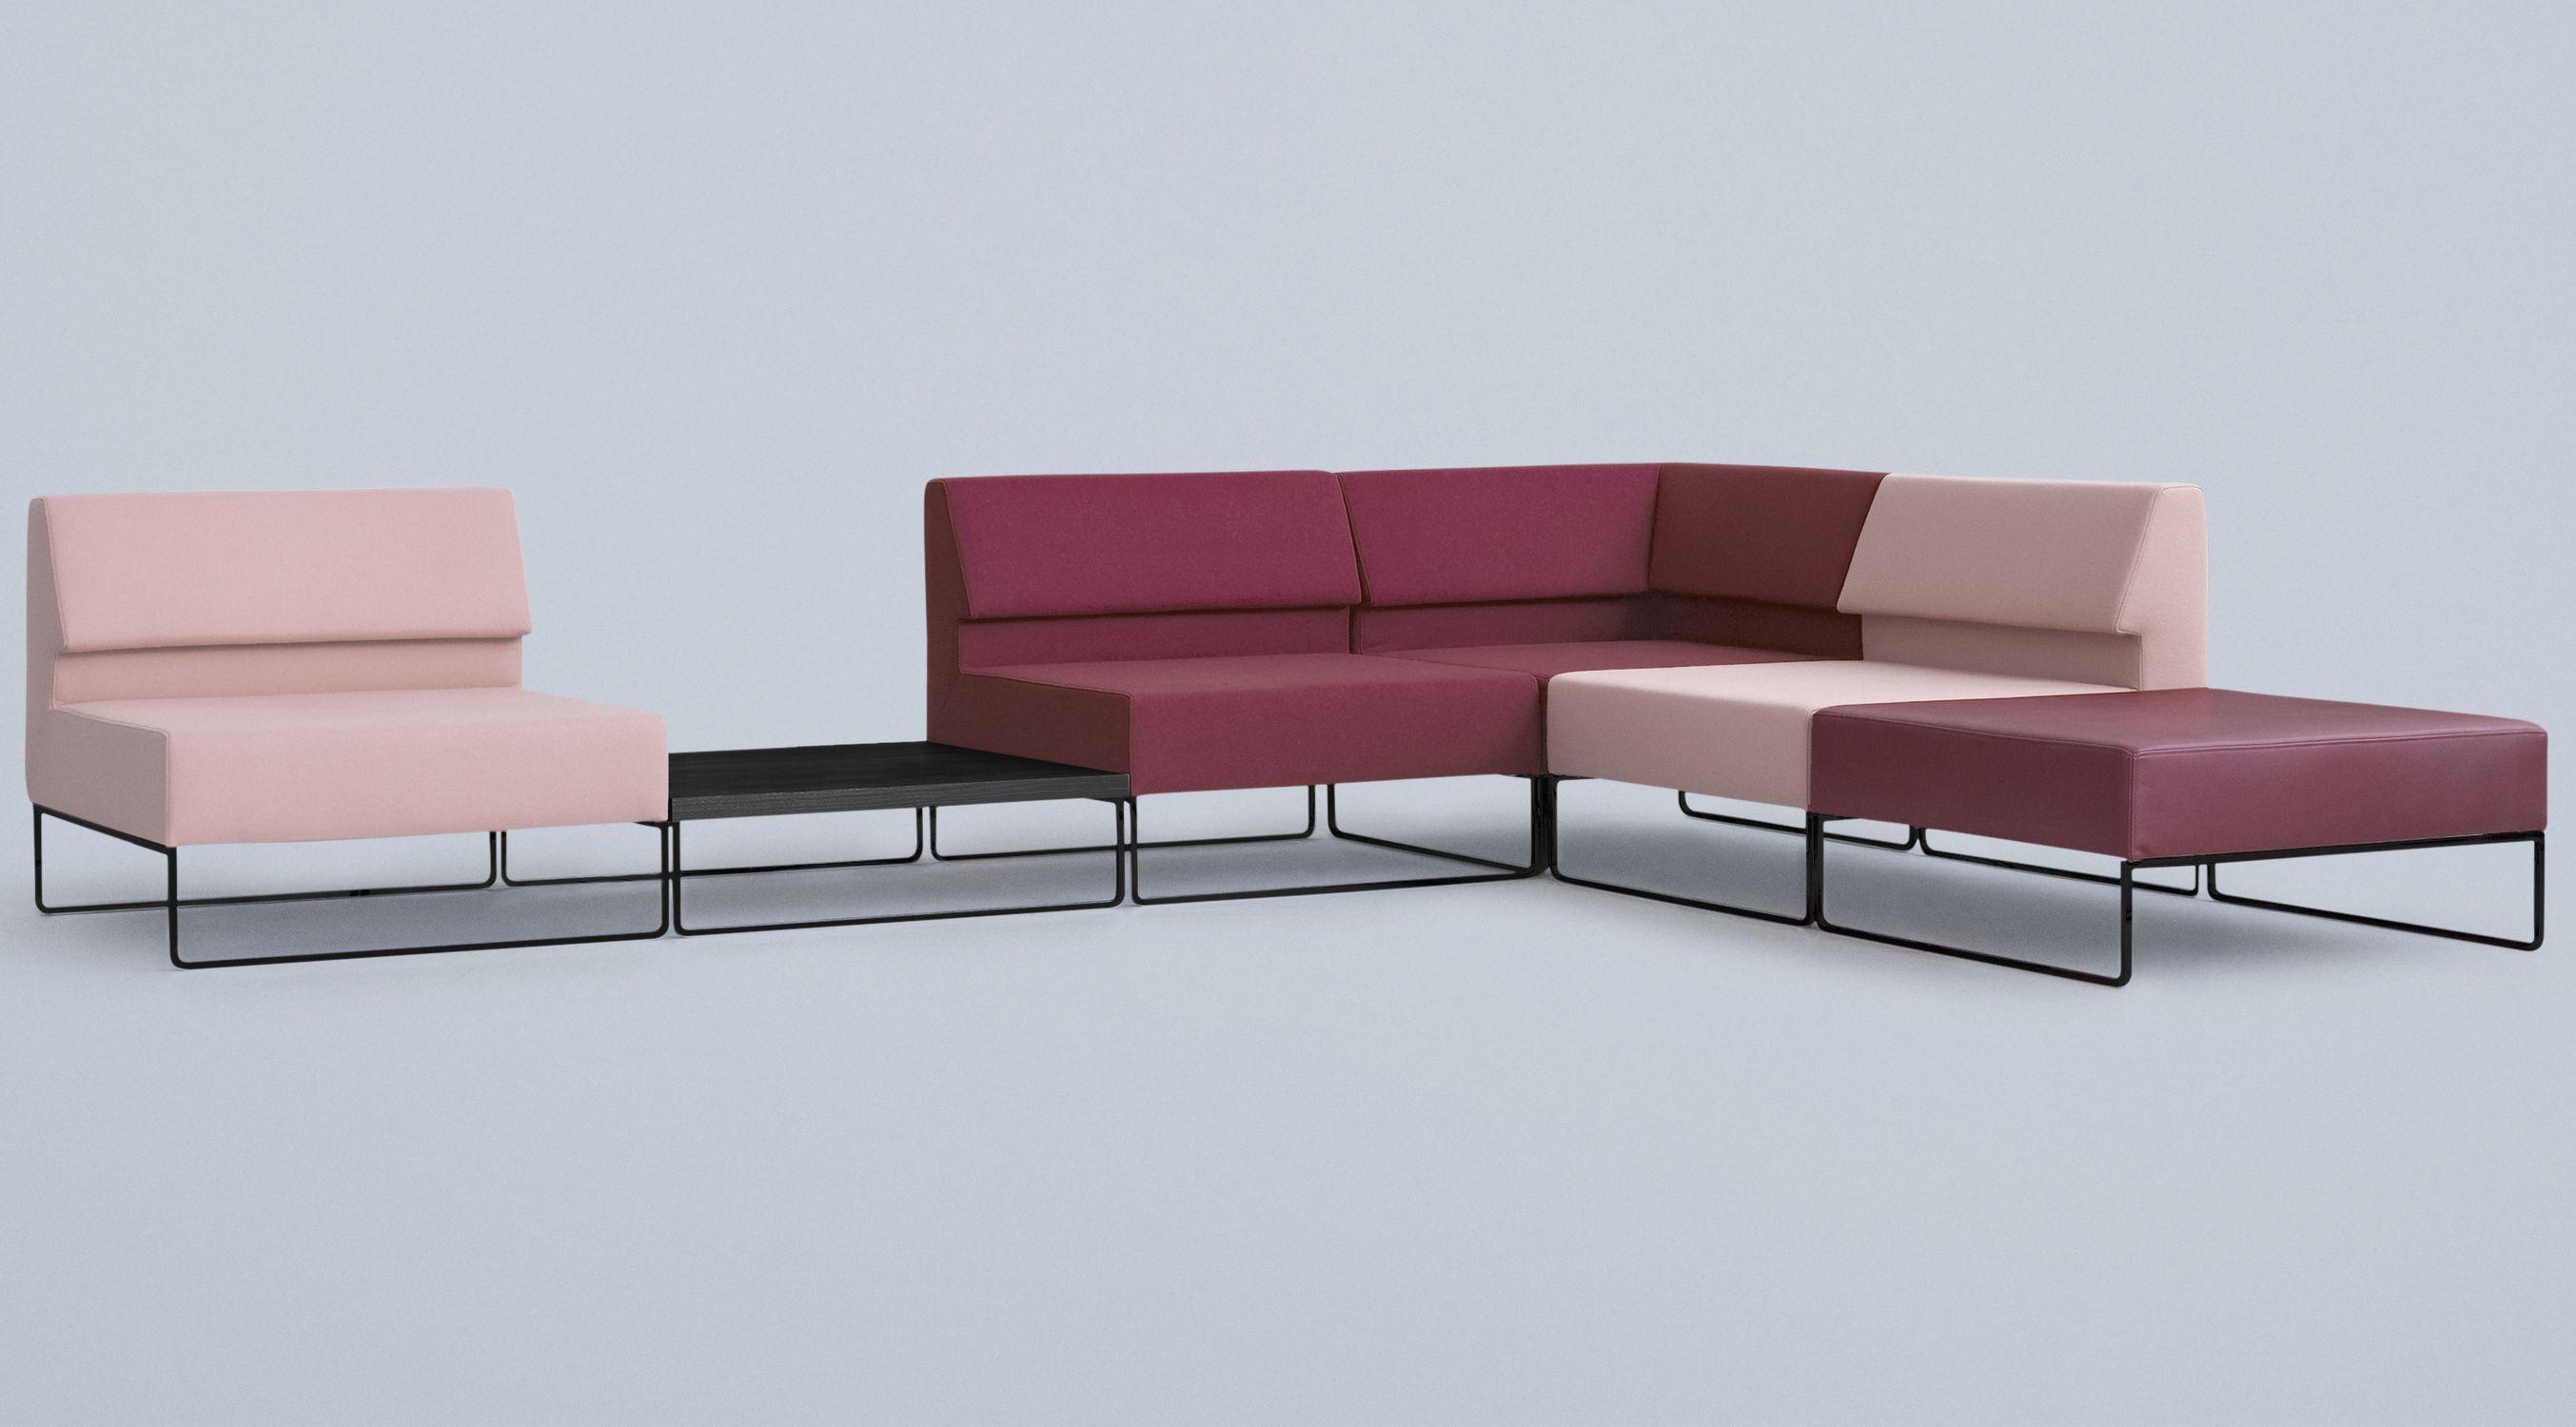 Moderne ledercouch  Ecksofa / modulierbar / modern / Leder - COUCH by Morten Voss - + ...